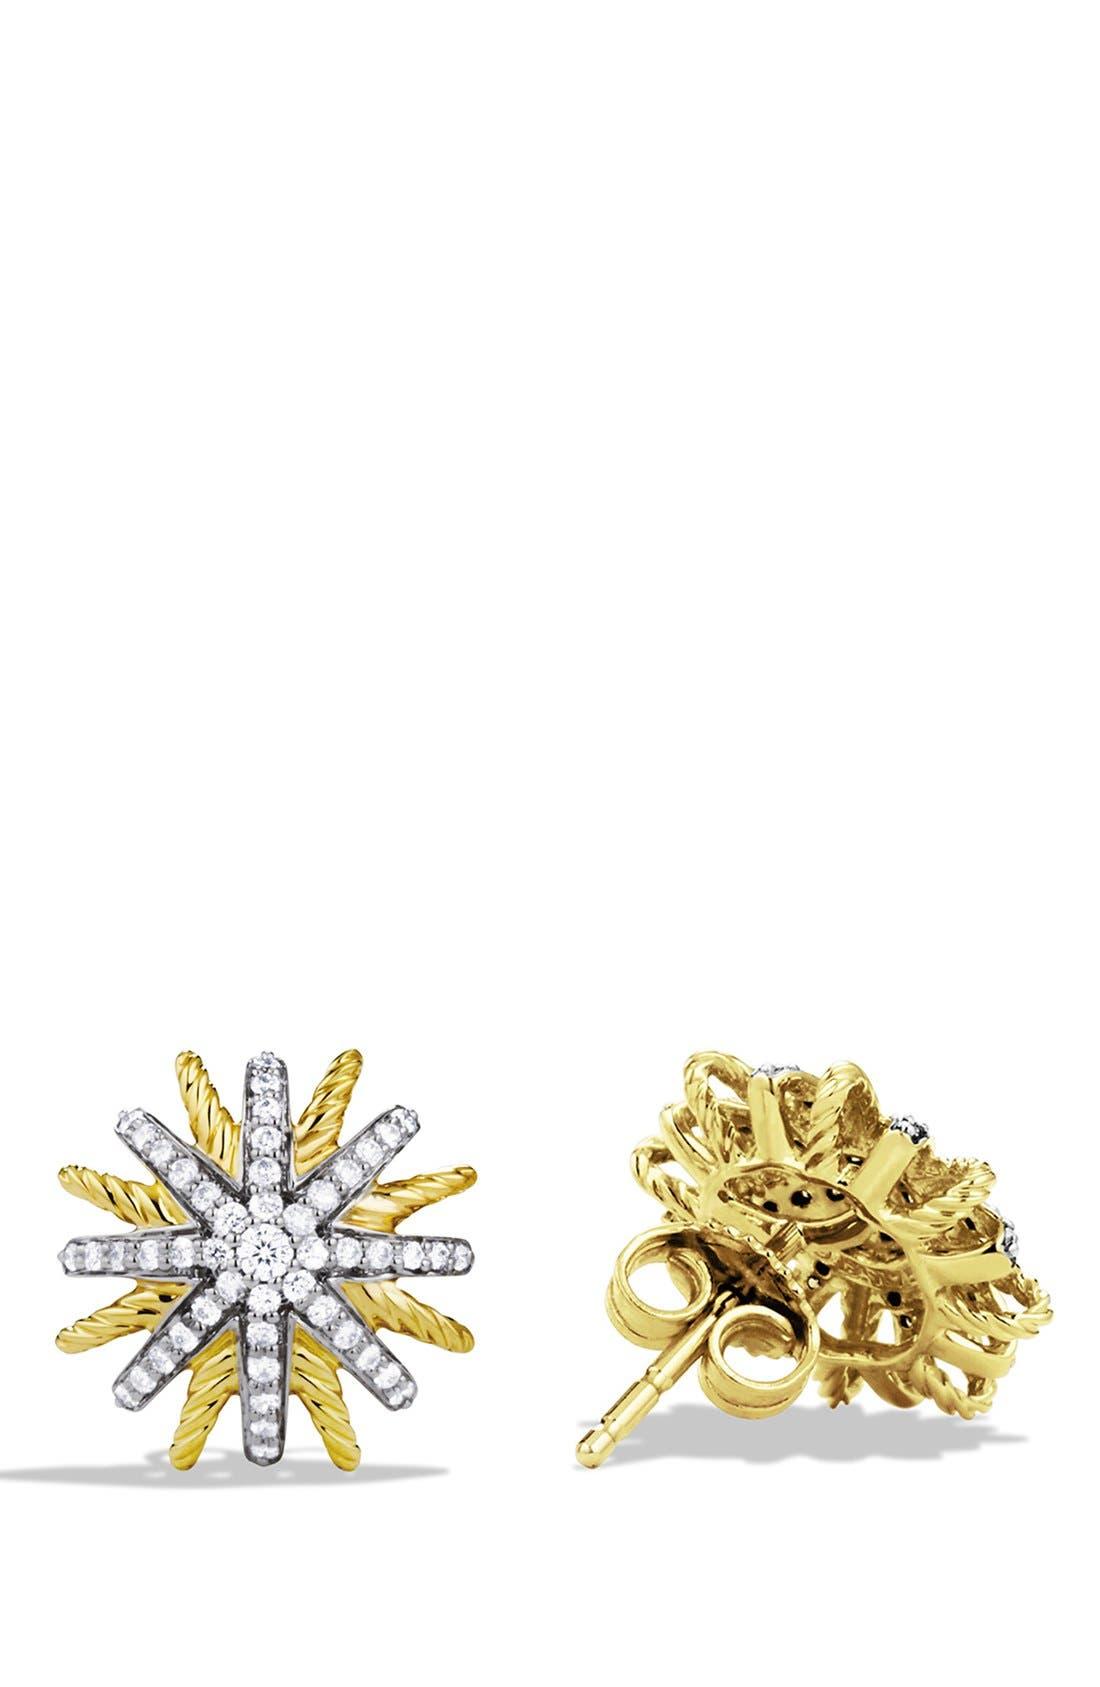 Alternate Image 2  - David Yurman 'Starburst' Extra-Small Earrings with Diamonds in Gold